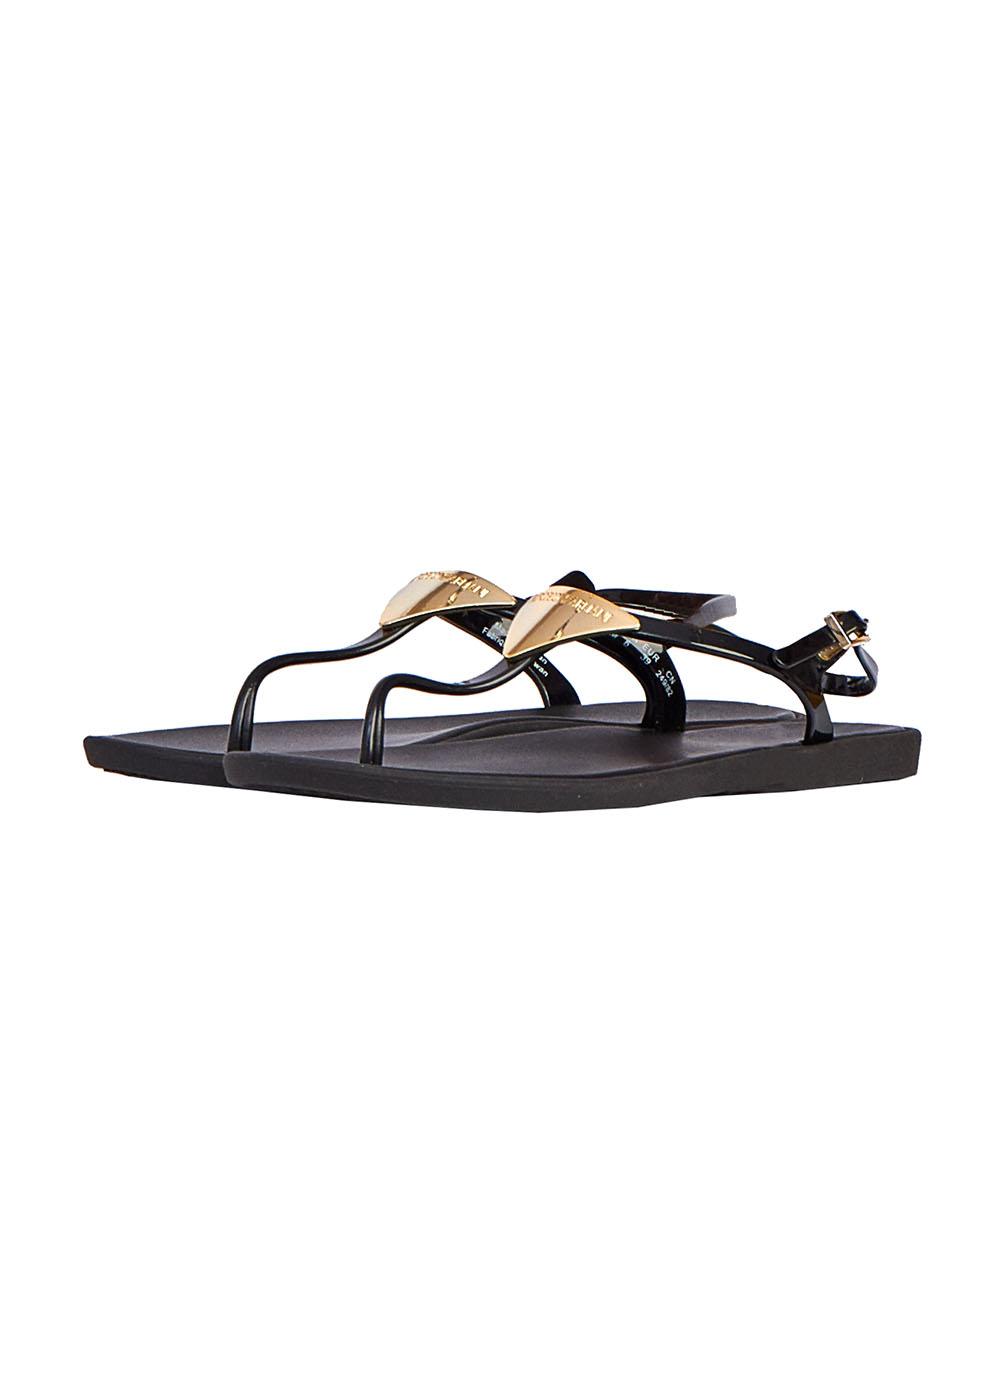 Emporio Armani сандалии